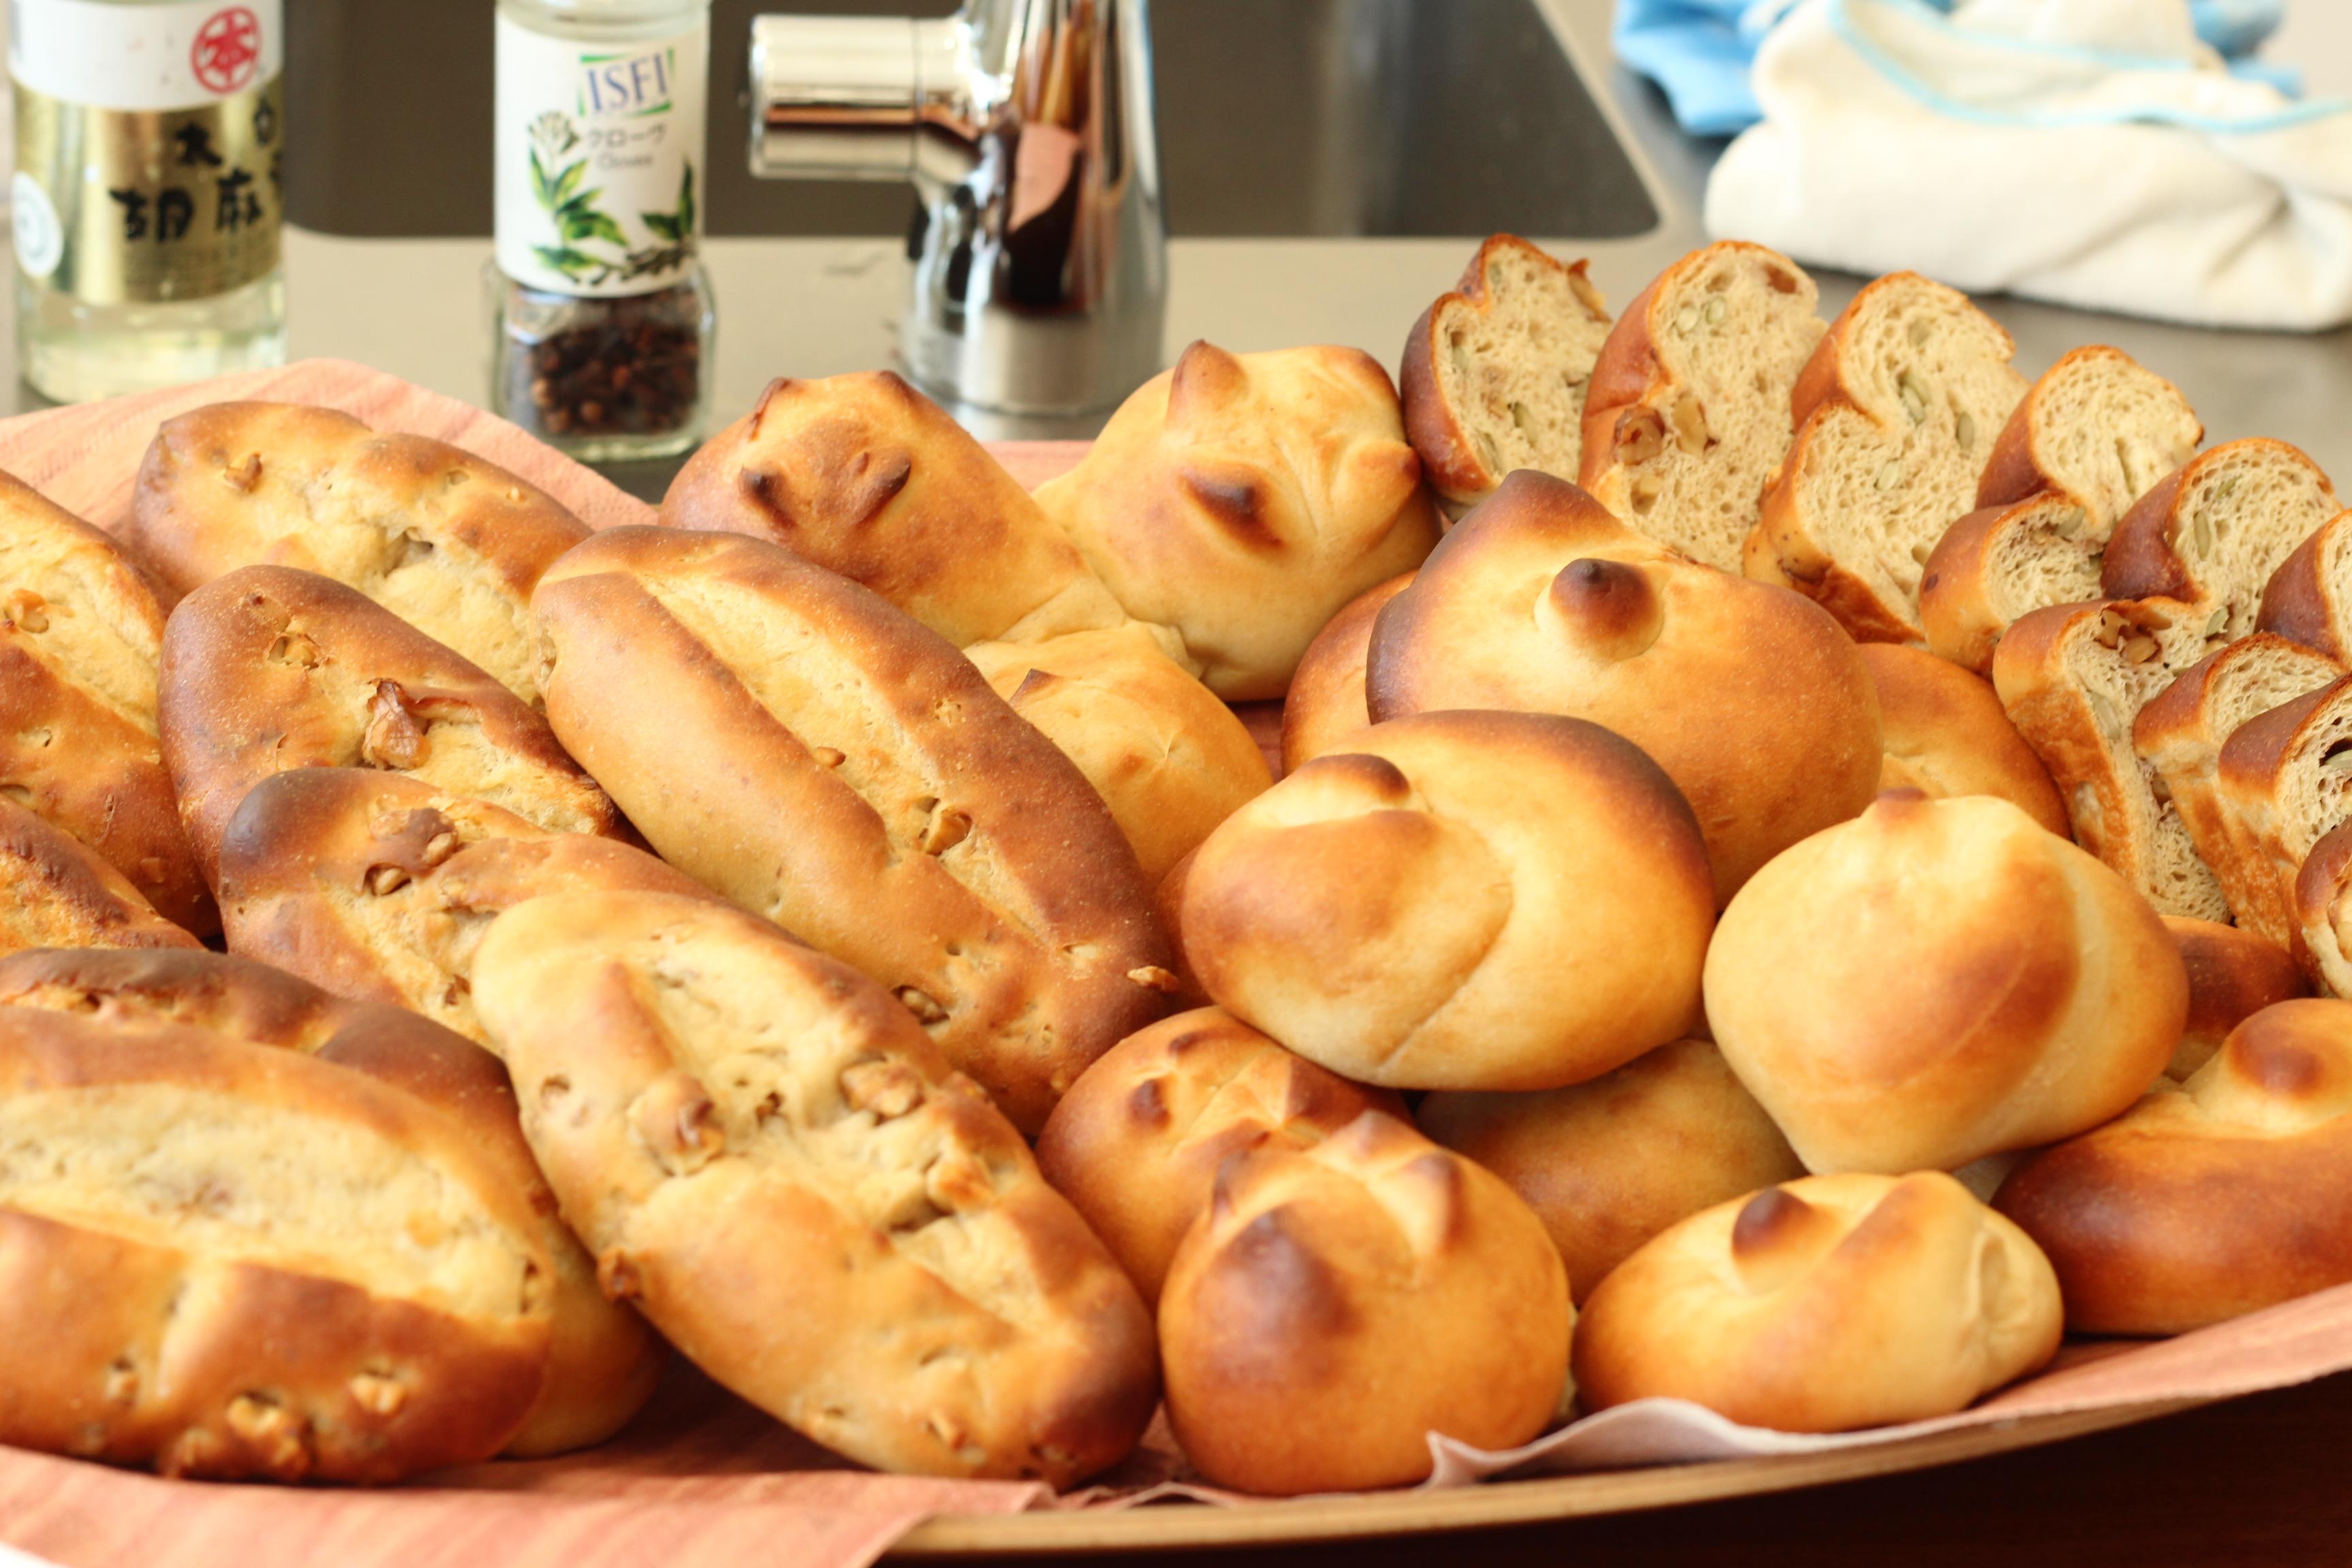 a-ta-sante糖質制限パン料理教室。京都江部粉糖質制限パン体験会『プチパン&トルティーヤ』